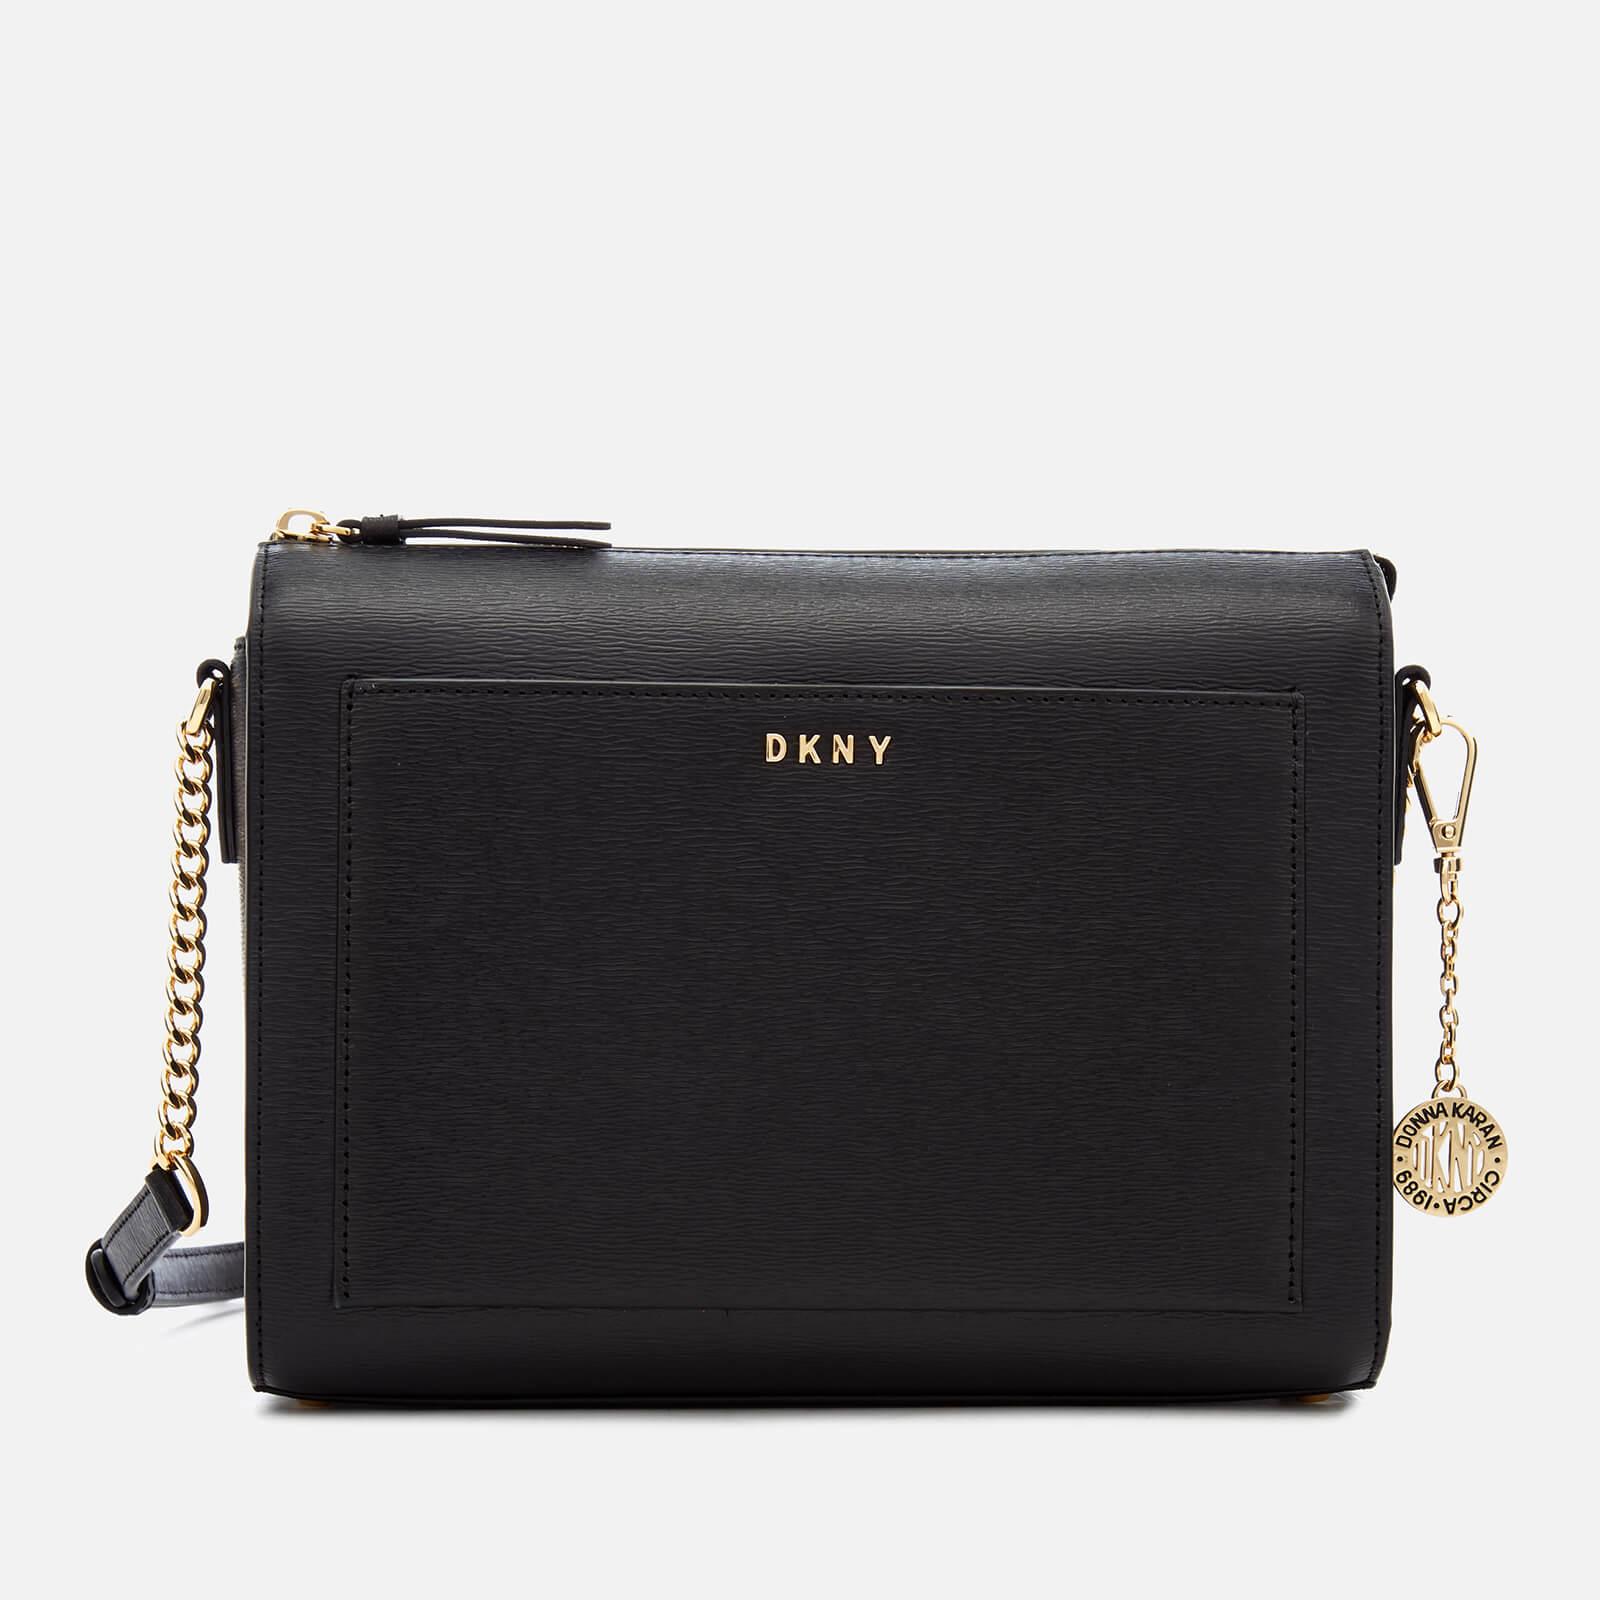 42a5a35f4aed DKNY Women s Bryant Medium Box Cross Body Bag - Black Womens Accessories